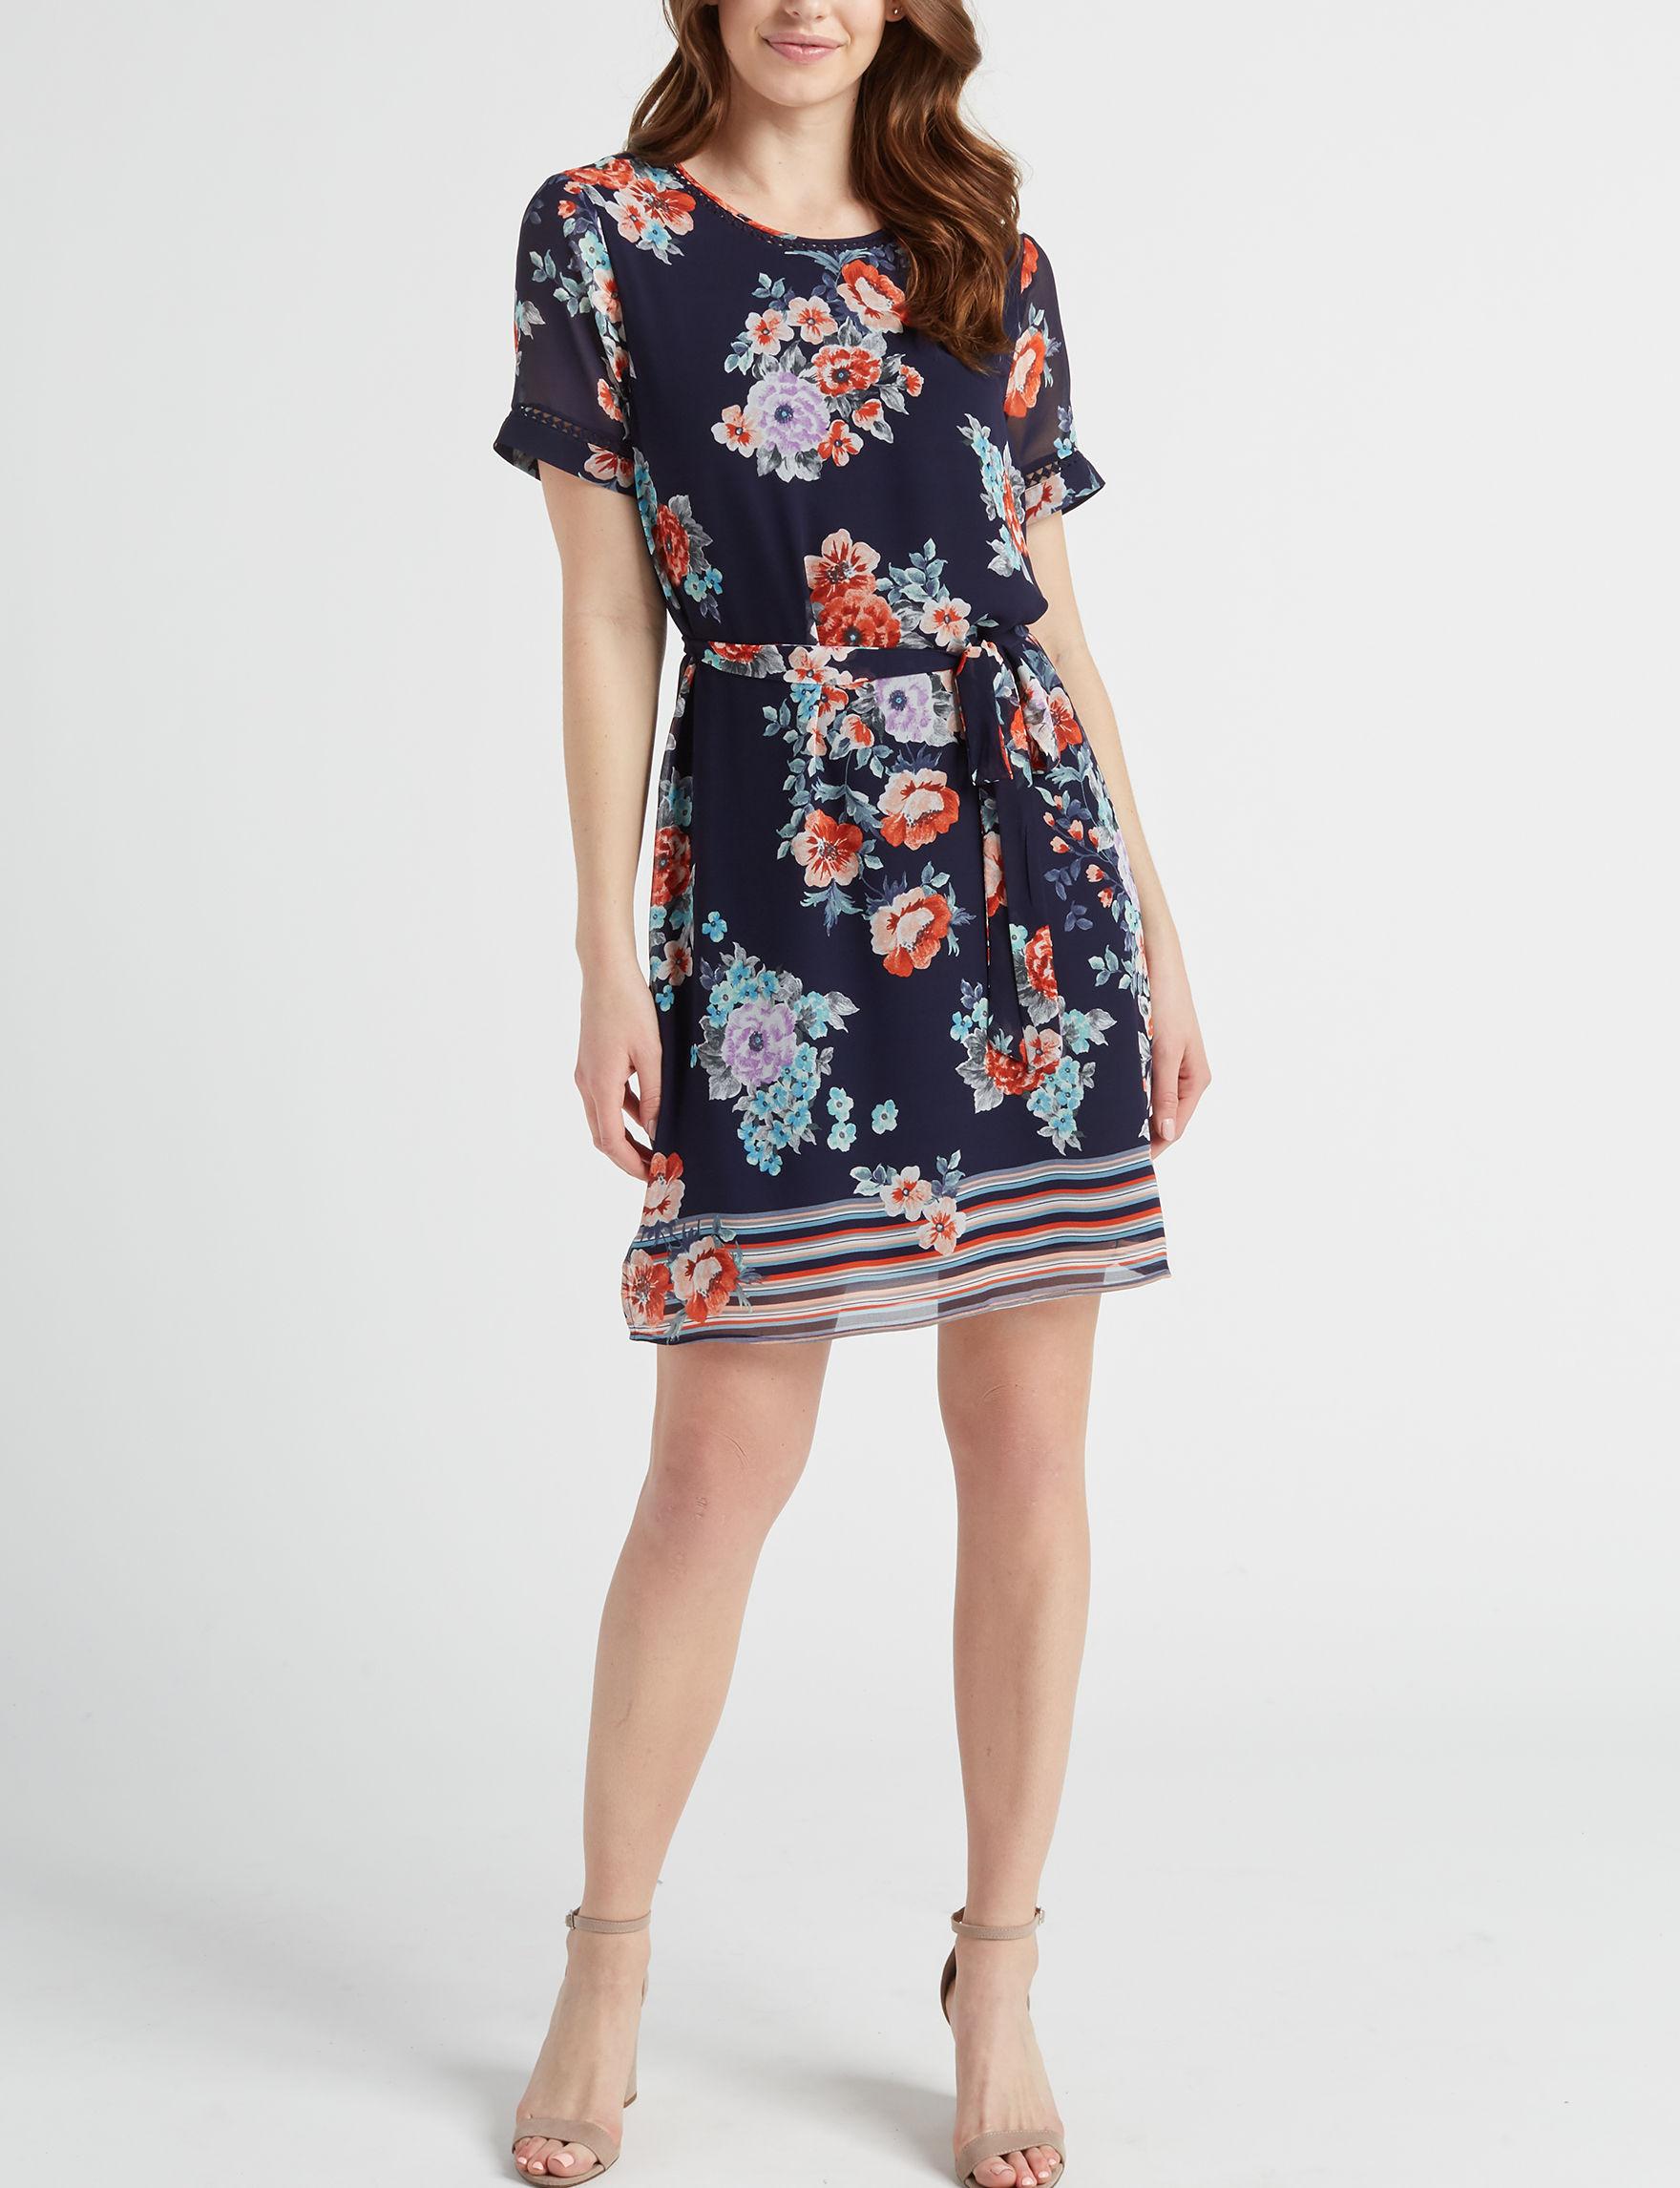 Signature Studio Blue Floral Everyday & Casual Shirt Dresses